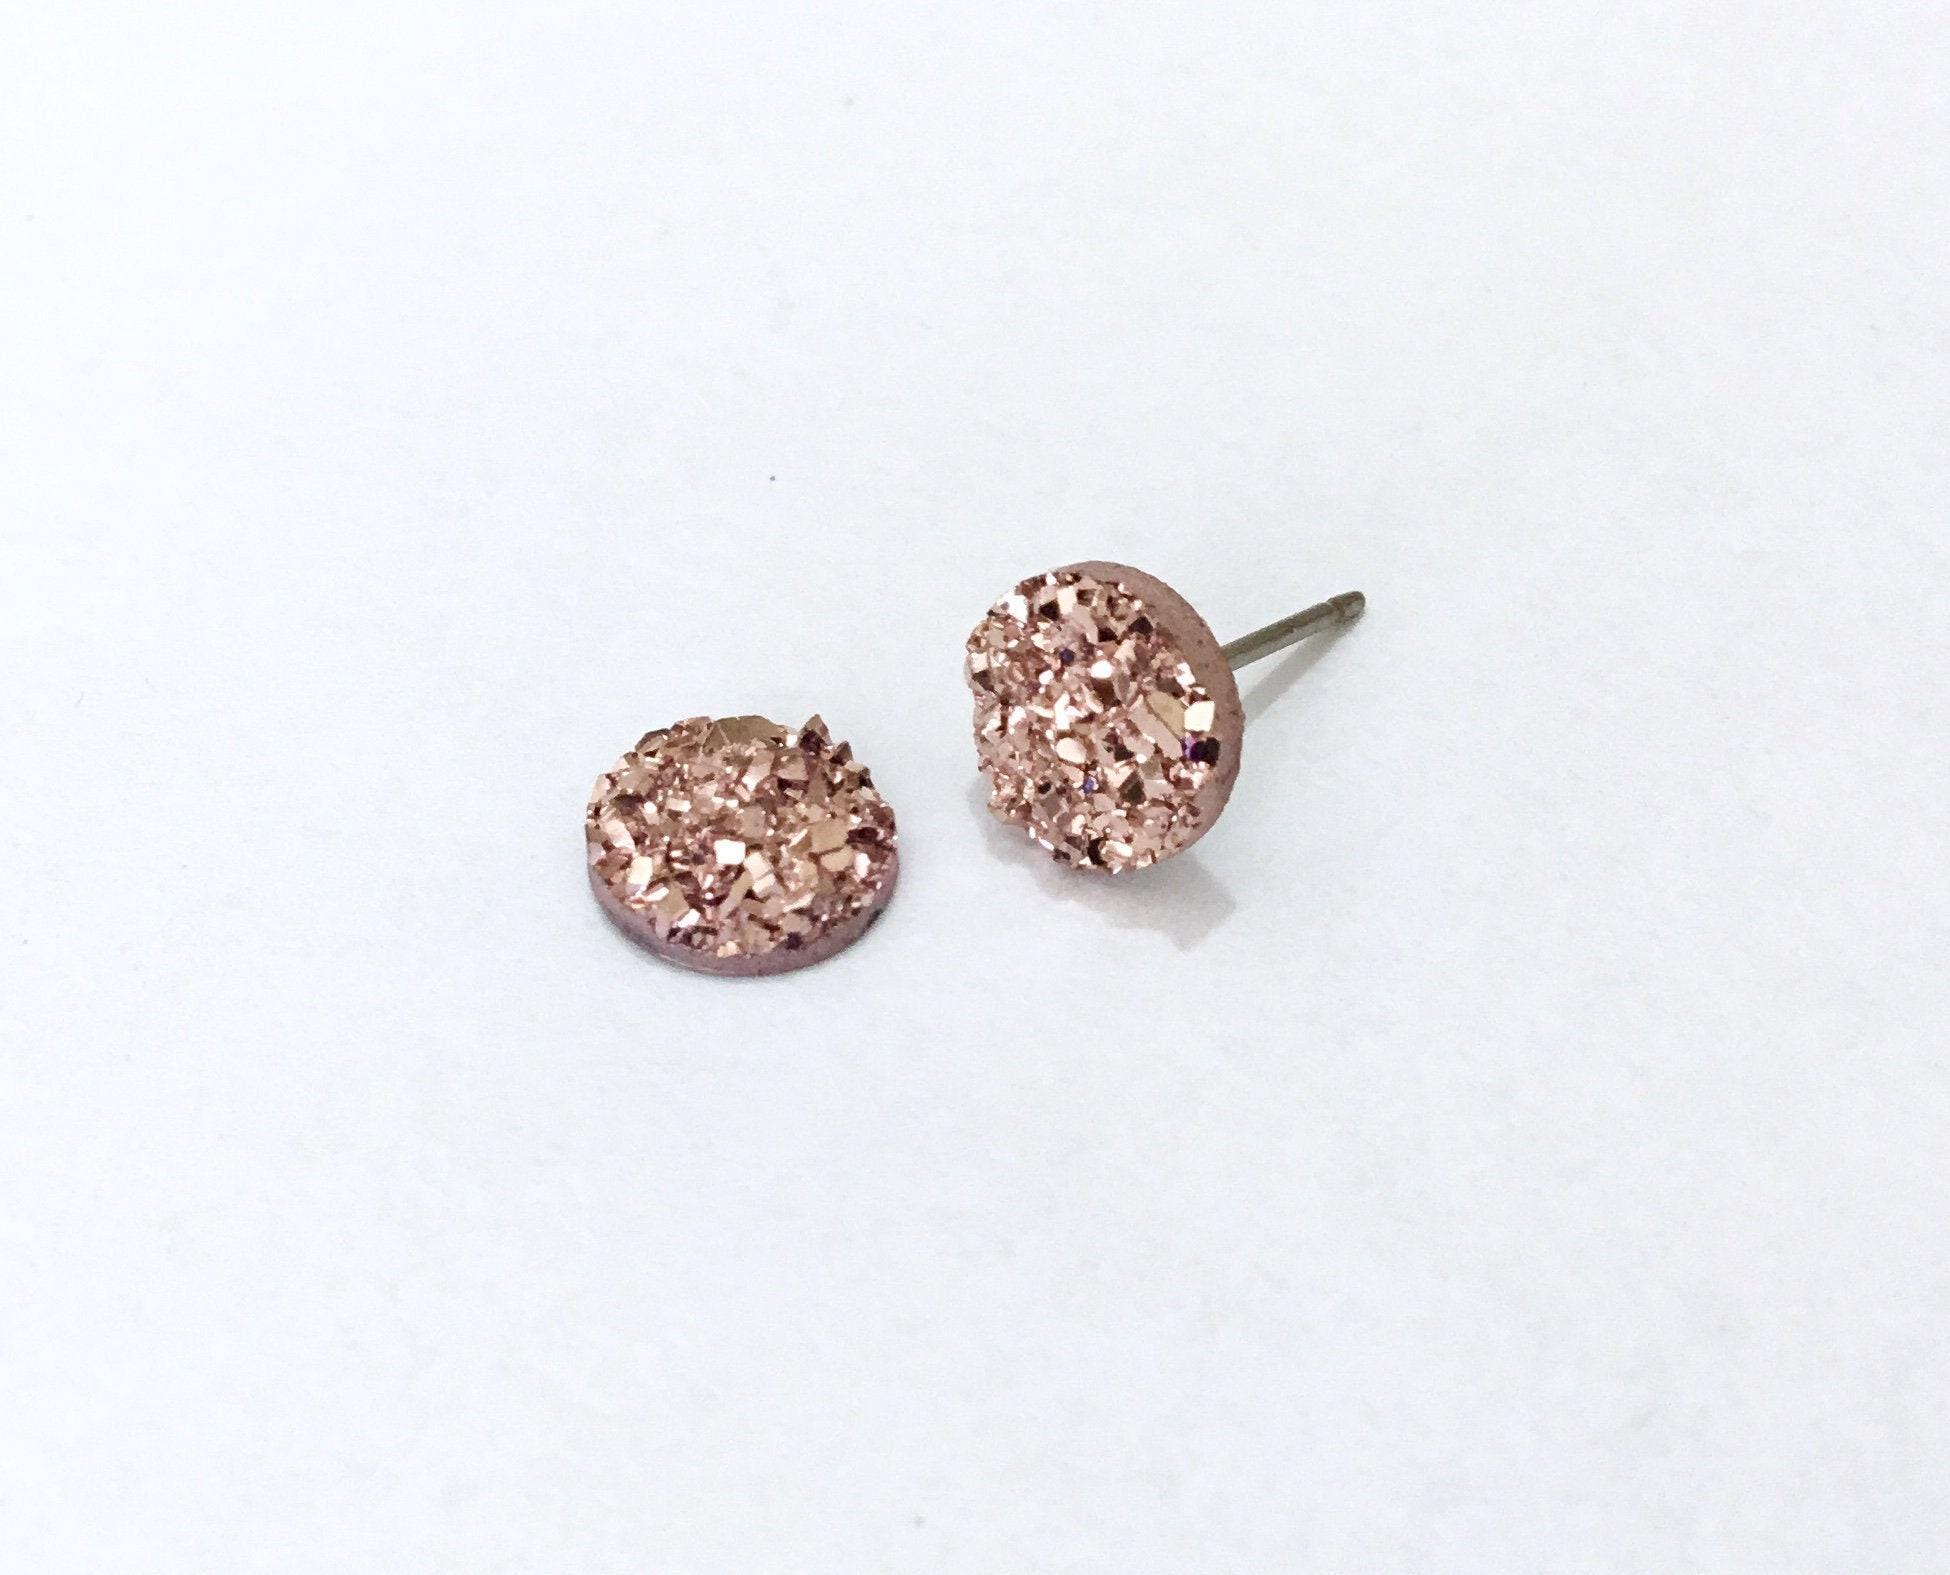 Druzy Earrings Bridesmaid Gift Minimalist Jewelry Post Earrings Druzy Stud Earrings